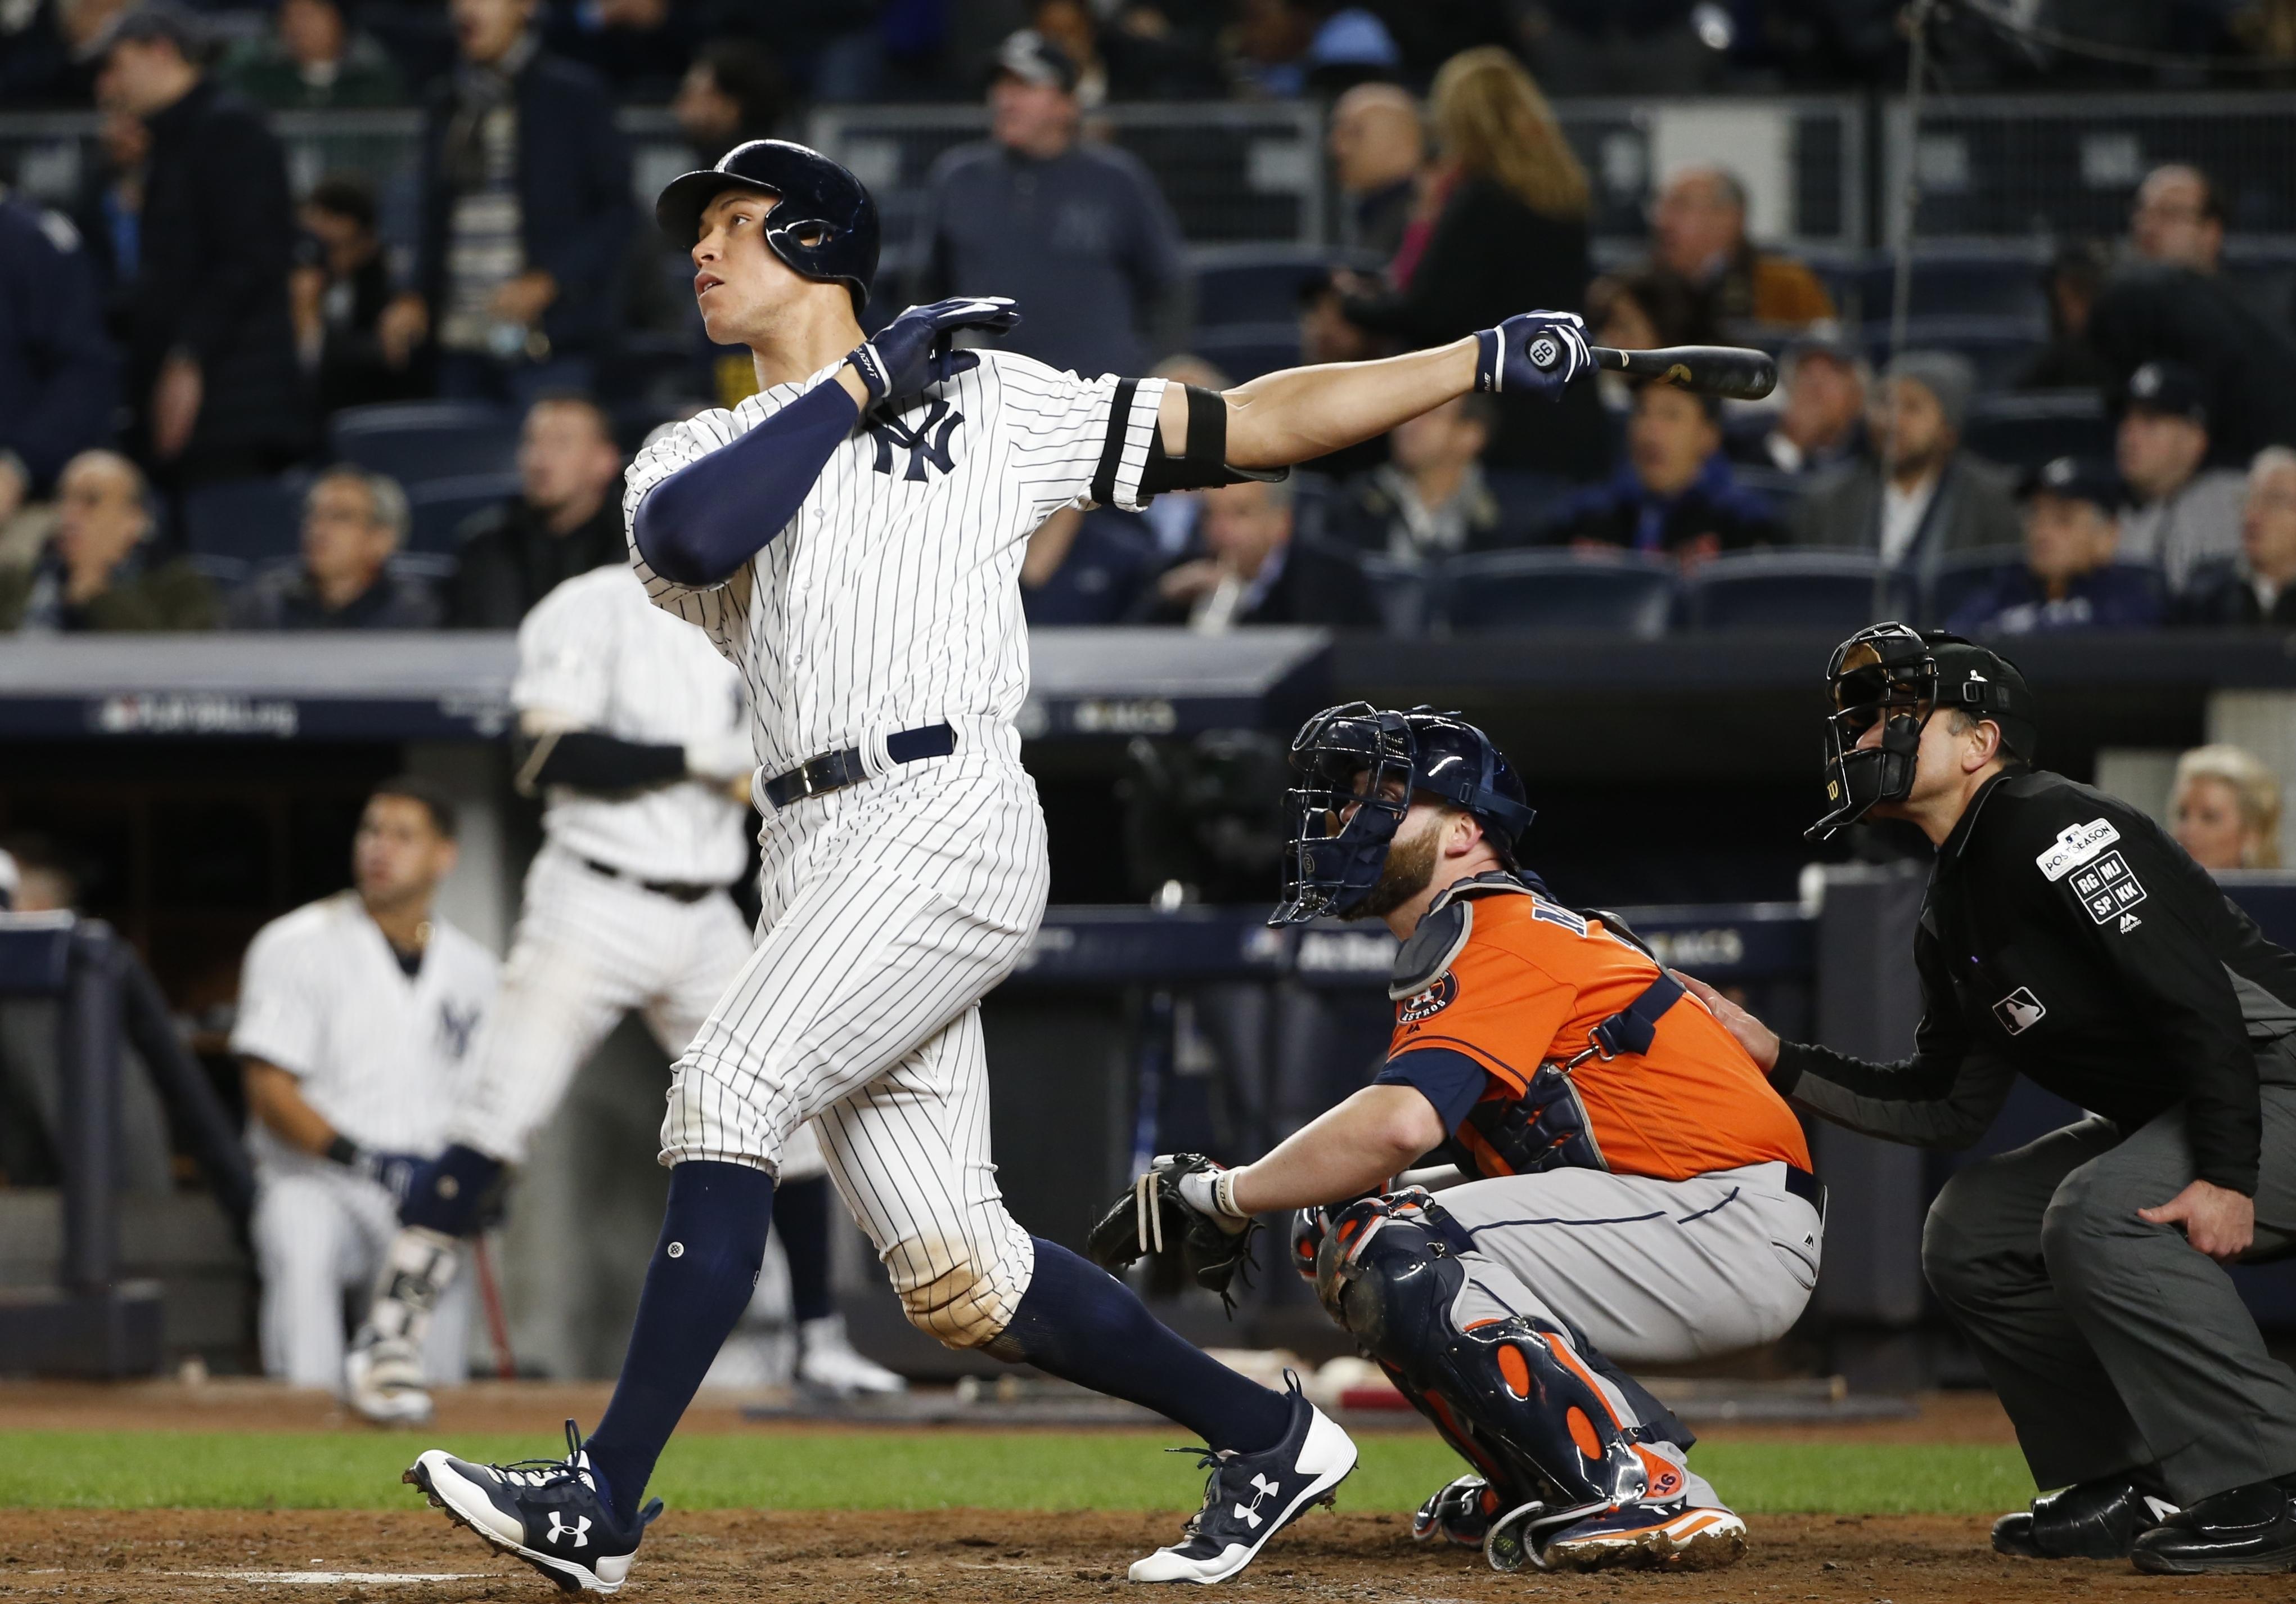 Aaron Judge's bat awakens during Yankees comeback win in Game 4